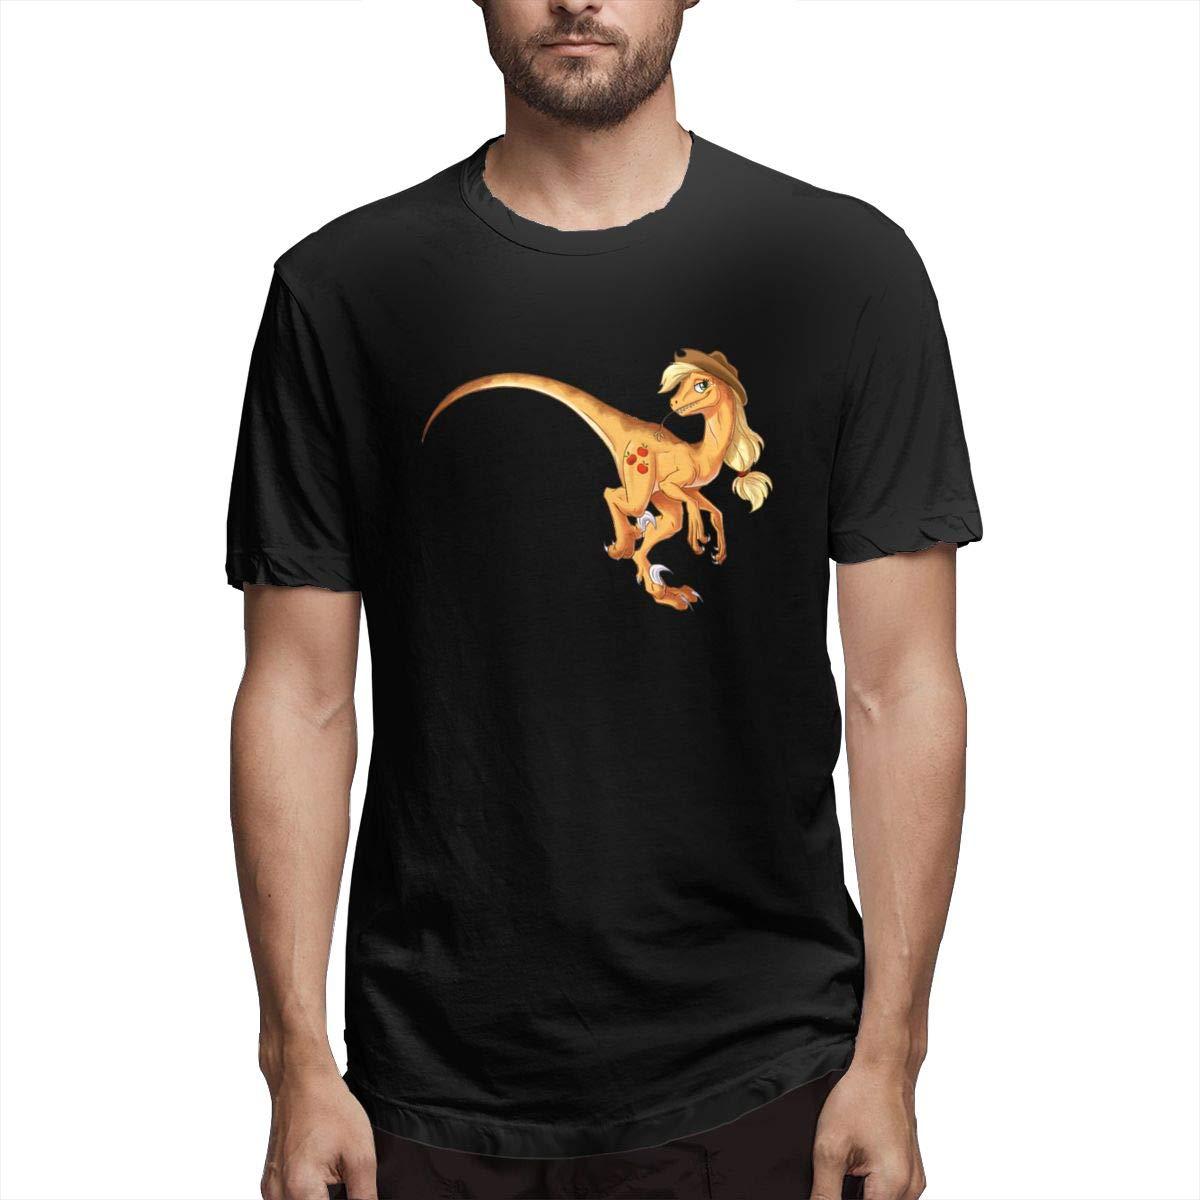 Xuforget Mens Dinosaur Love Weekend Short Sleeve Shirts Cotton Tops